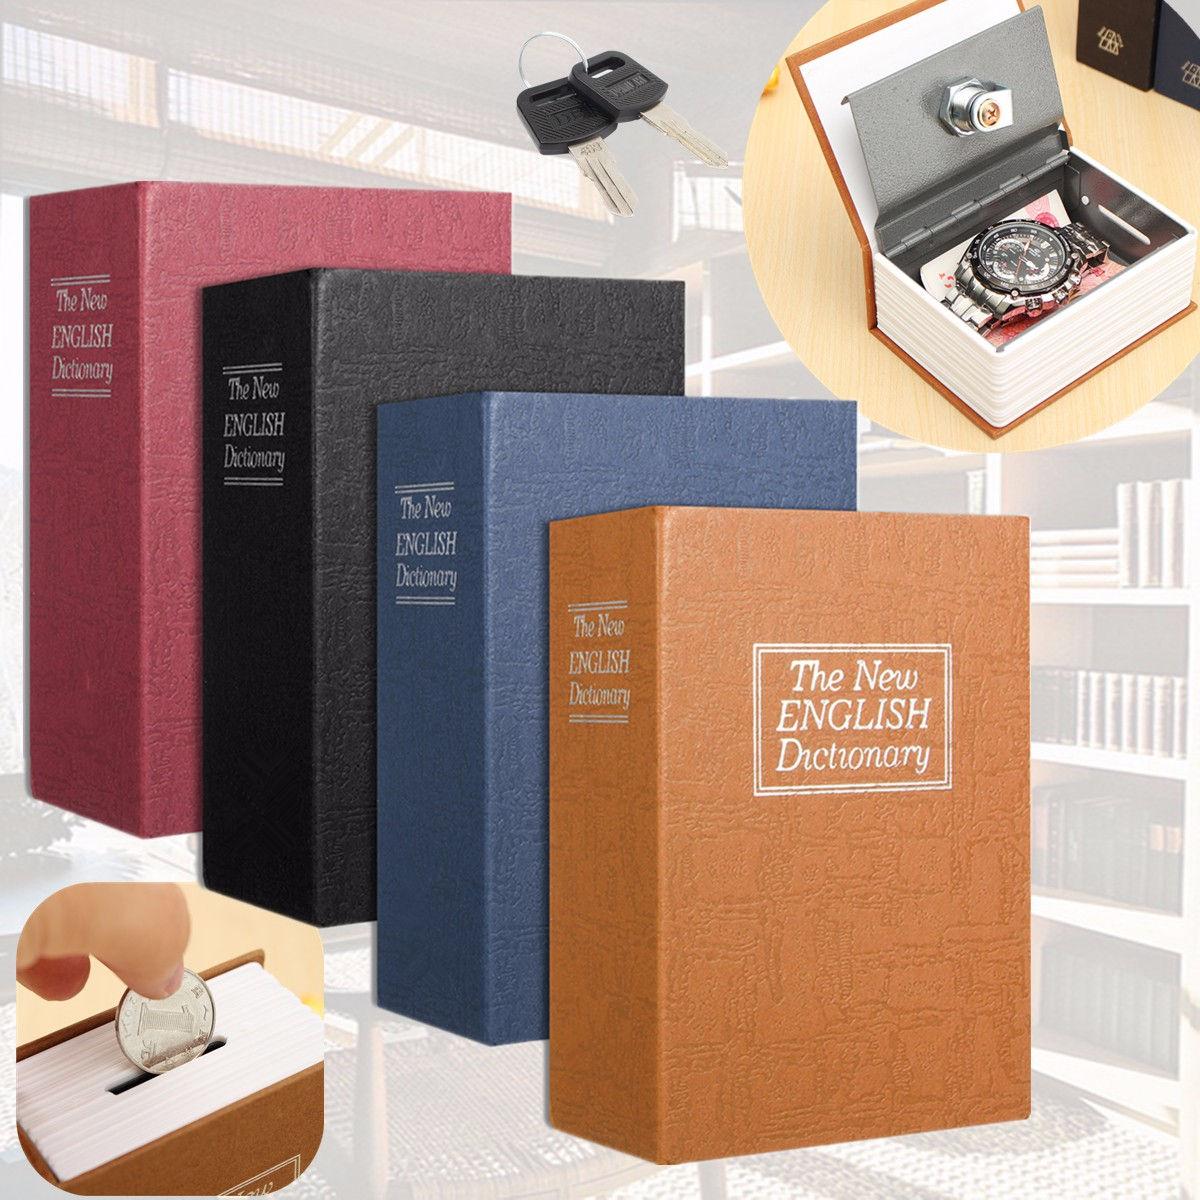 Cash Money Coin Storage Jewellery Key Locker Dictionary Mini Safe Box Book Money Hide Secret Security Safe Lock Kid Gift